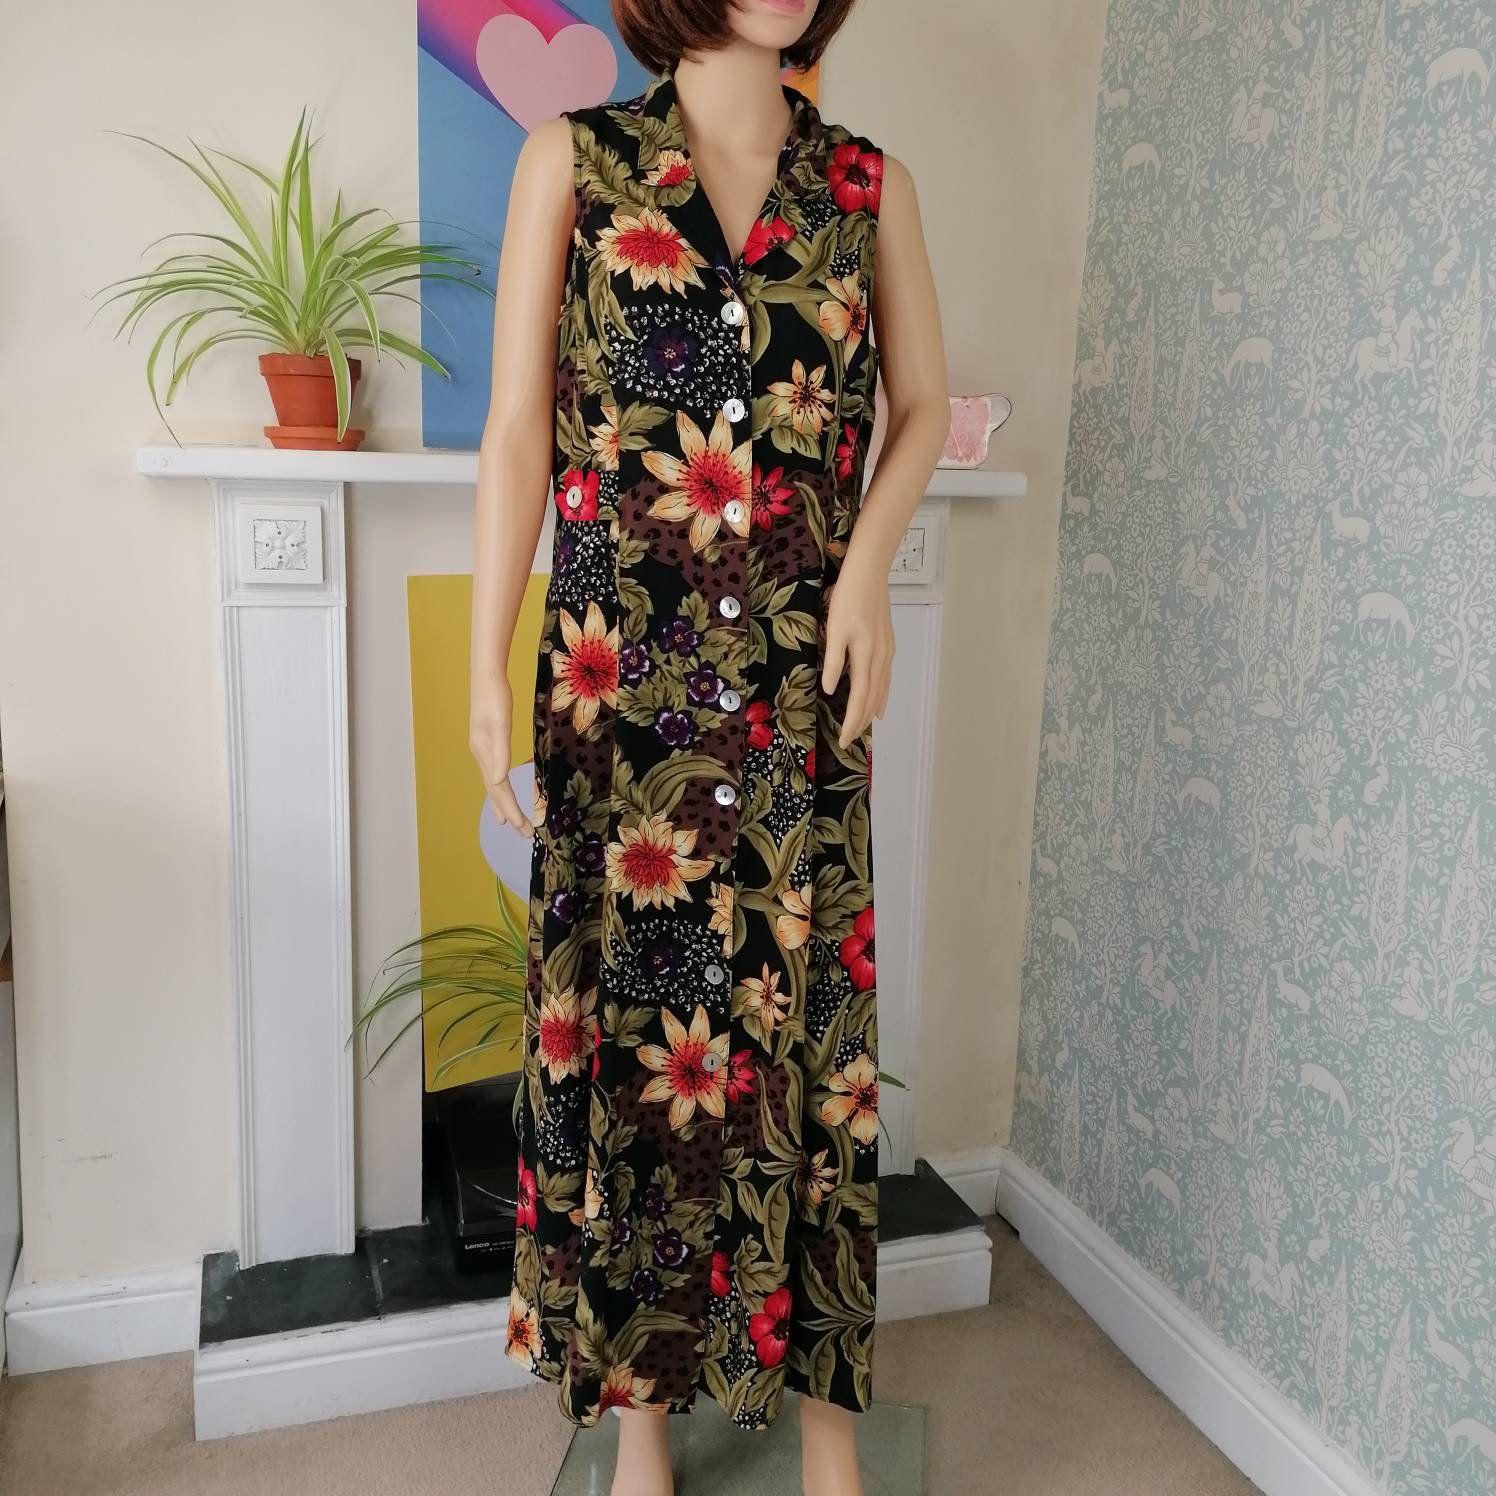 90s Vintage Maxi Dress Floral Button Front Size 12 14 Sleeveless Long Aline Summer Vneck Retro Day Sun Button D Vintage Maxi Dress Floral Maxi Dress Maxi Dress [ 1496 x 1496 Pixel ]